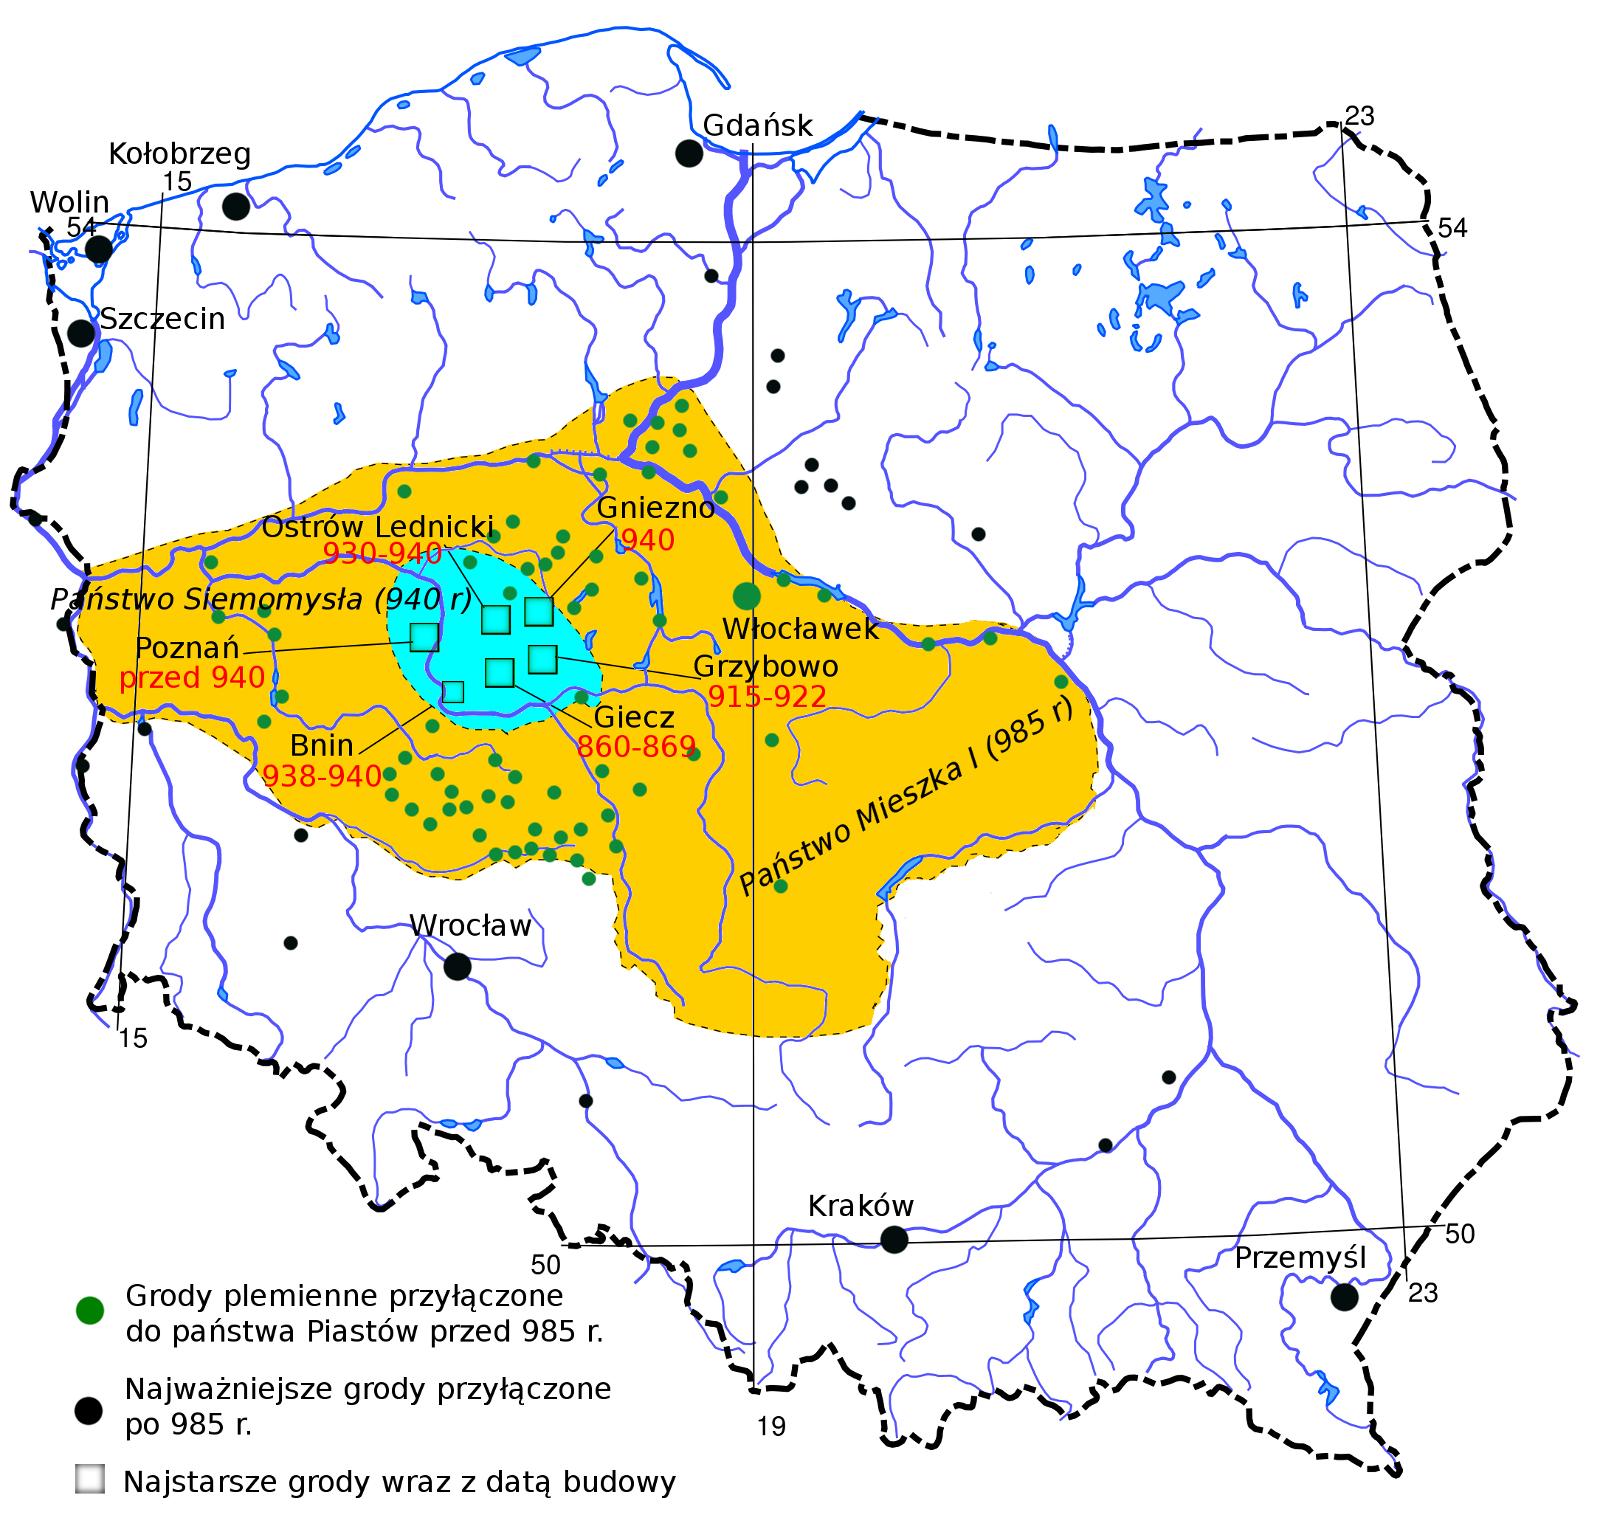 I. Mieszko,966, Dagome iudex